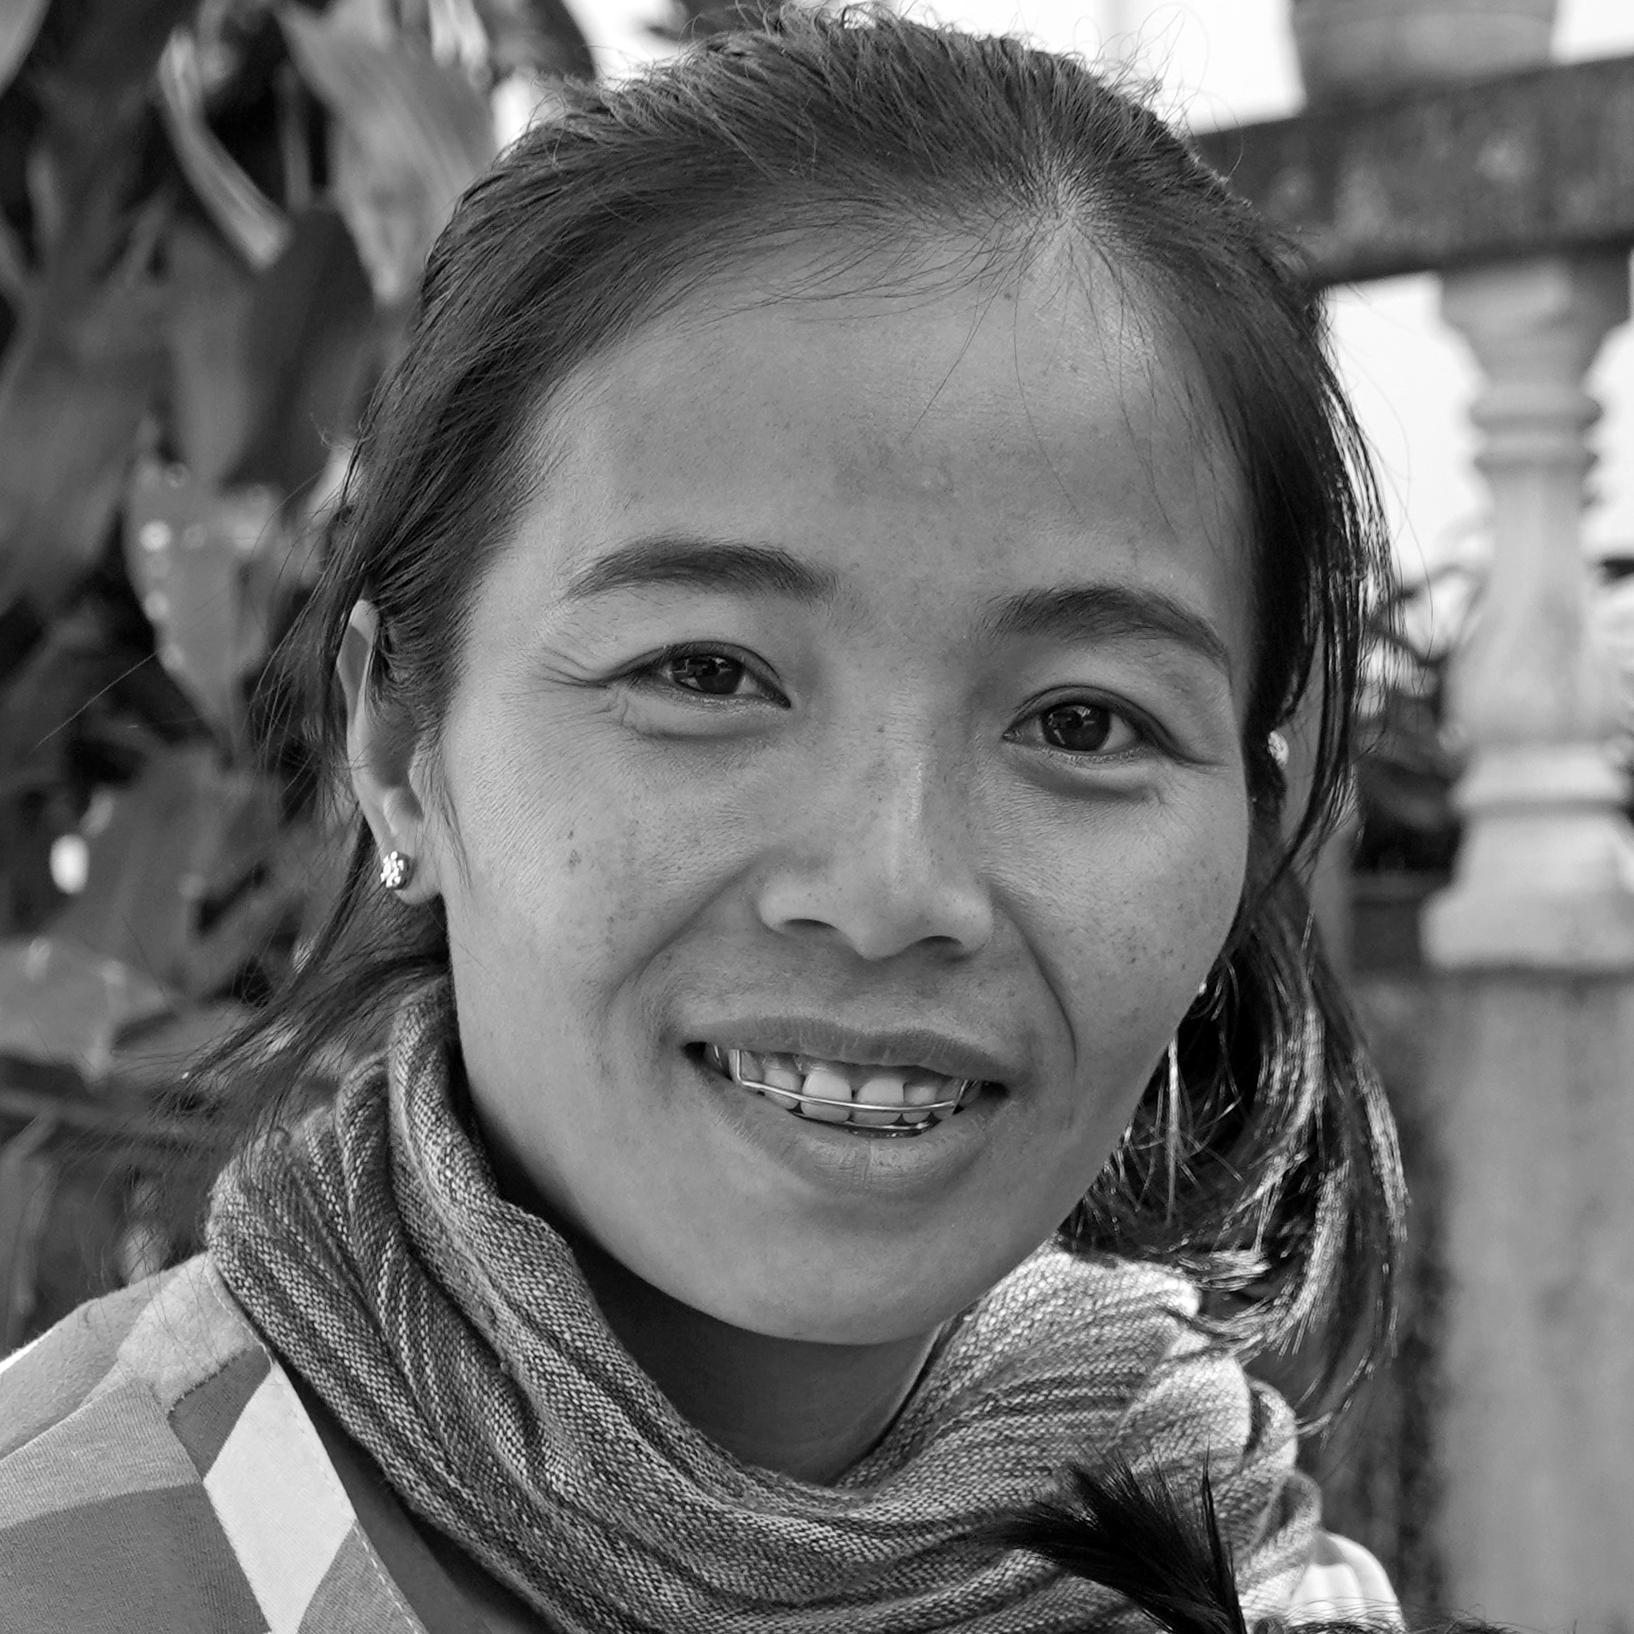 Nang Kham Kyar